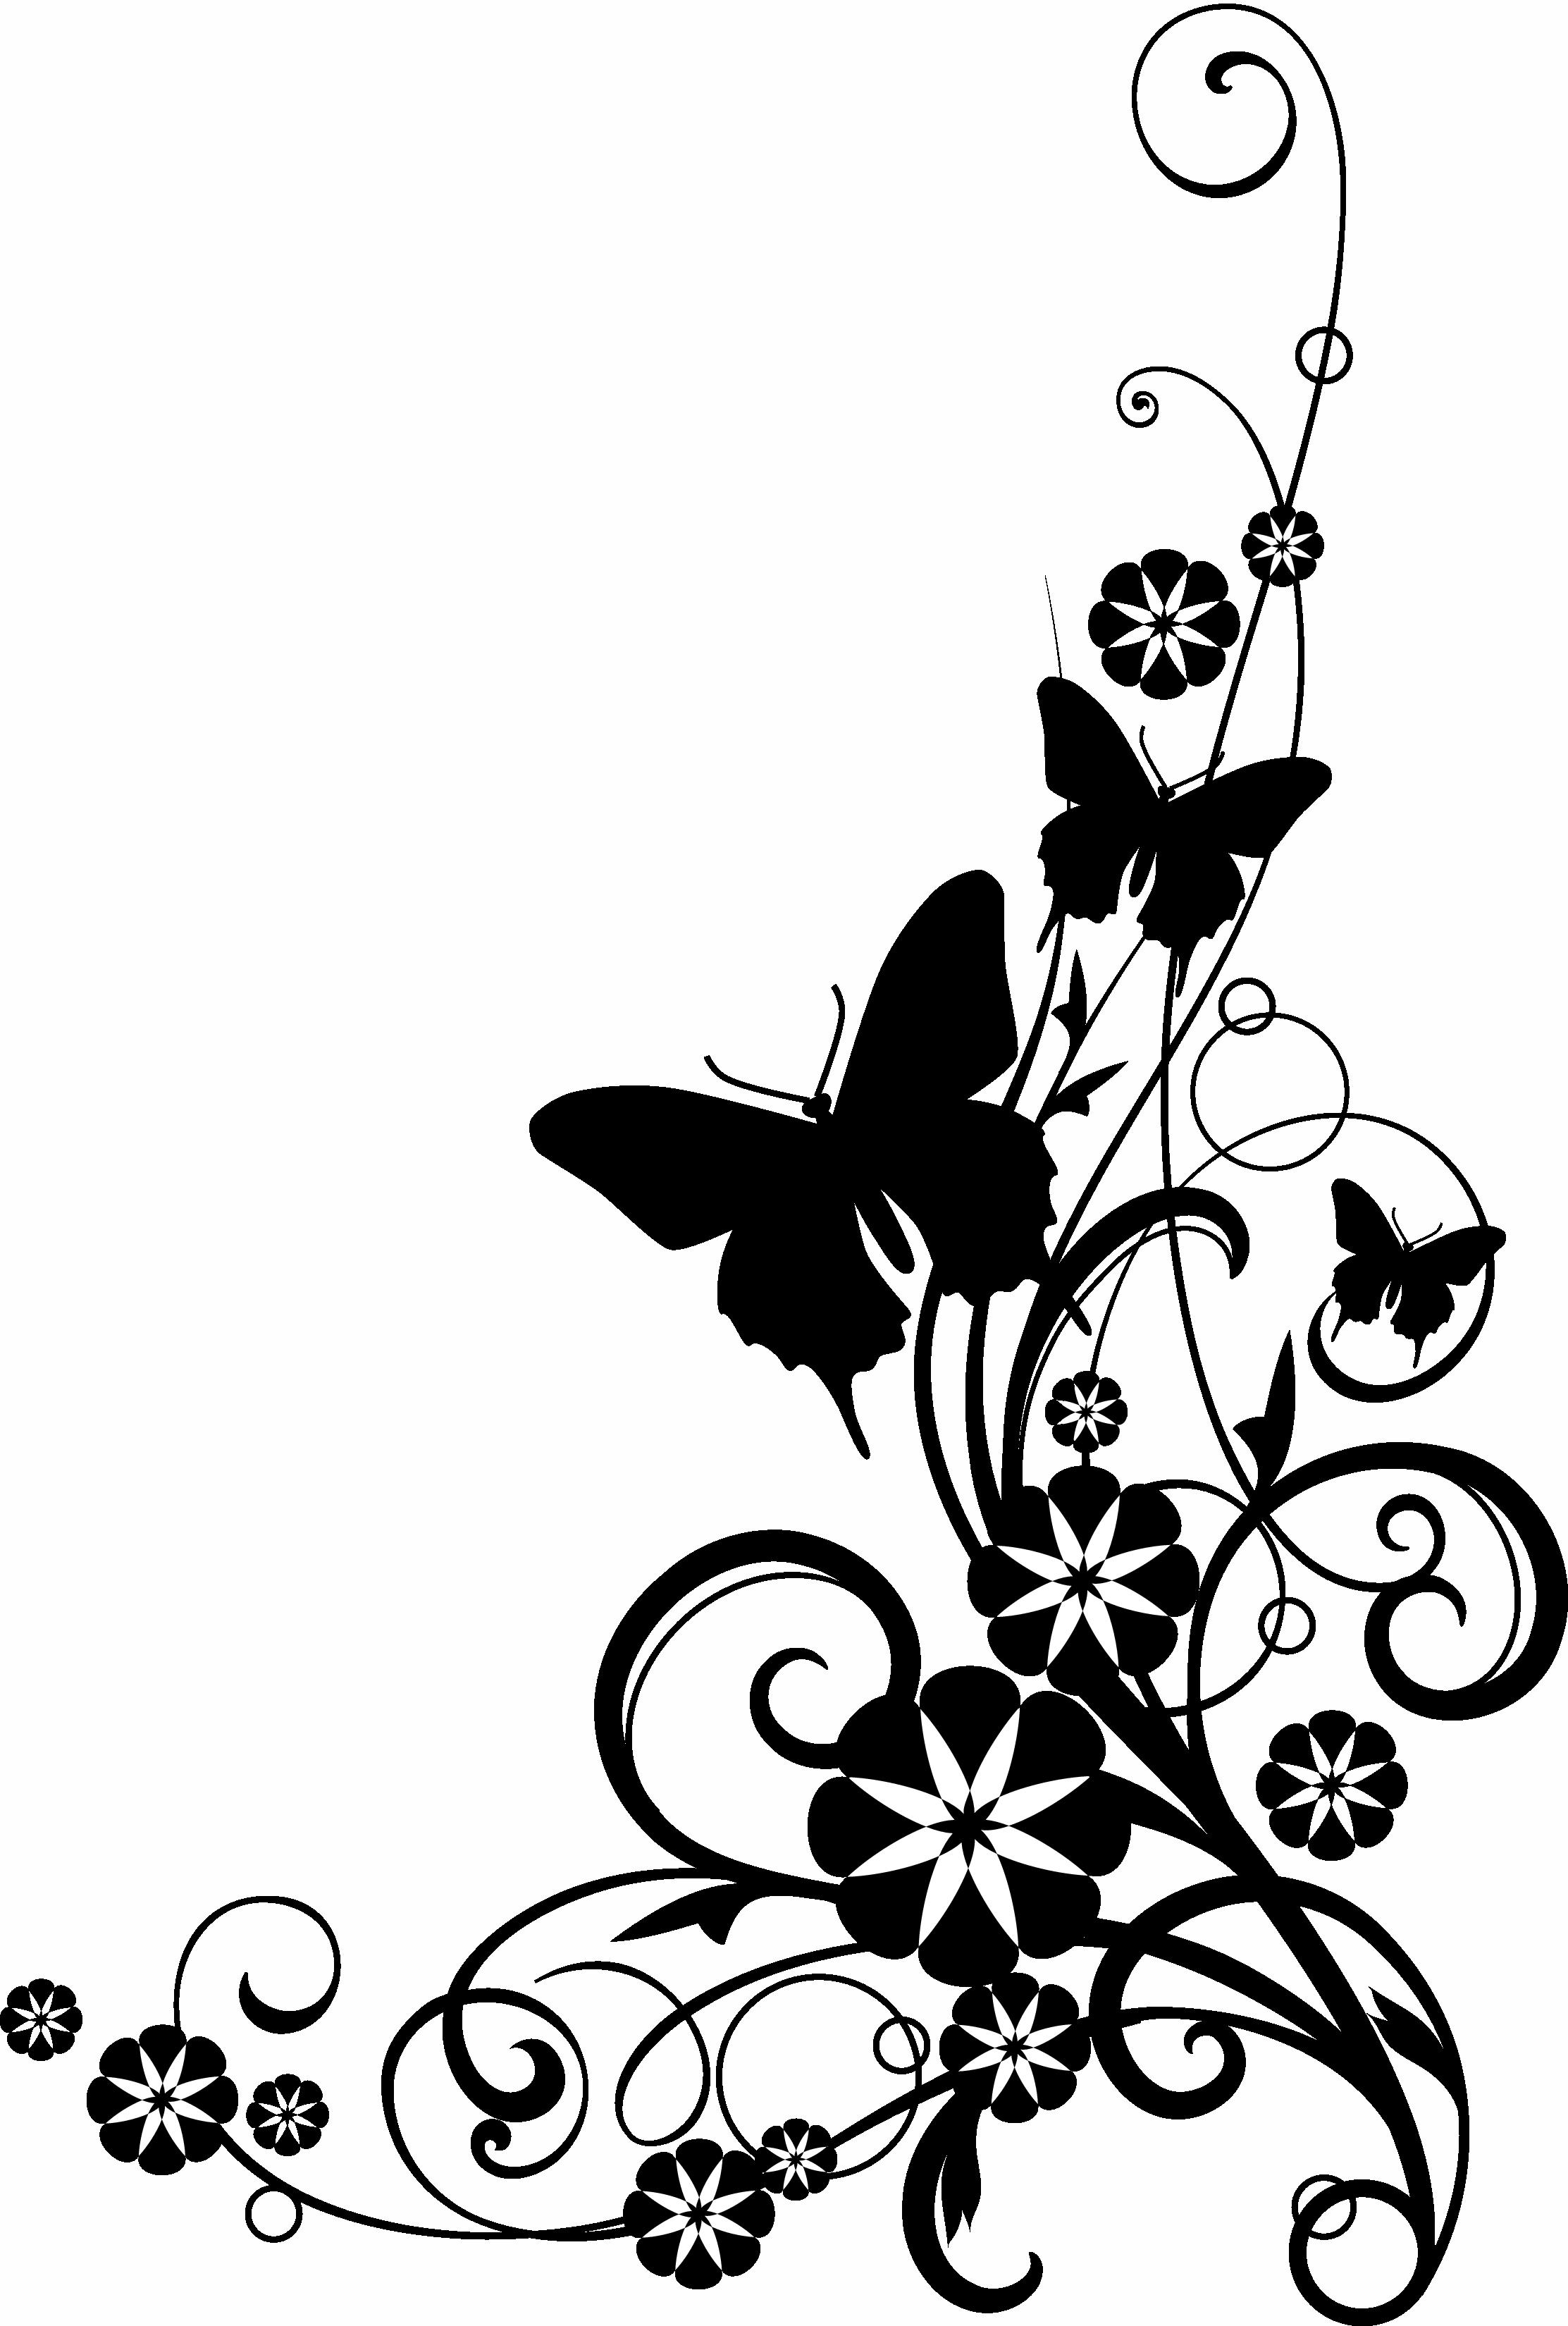 Flower Border Clip Art Hd-Flower Border Clip Art Hd-7